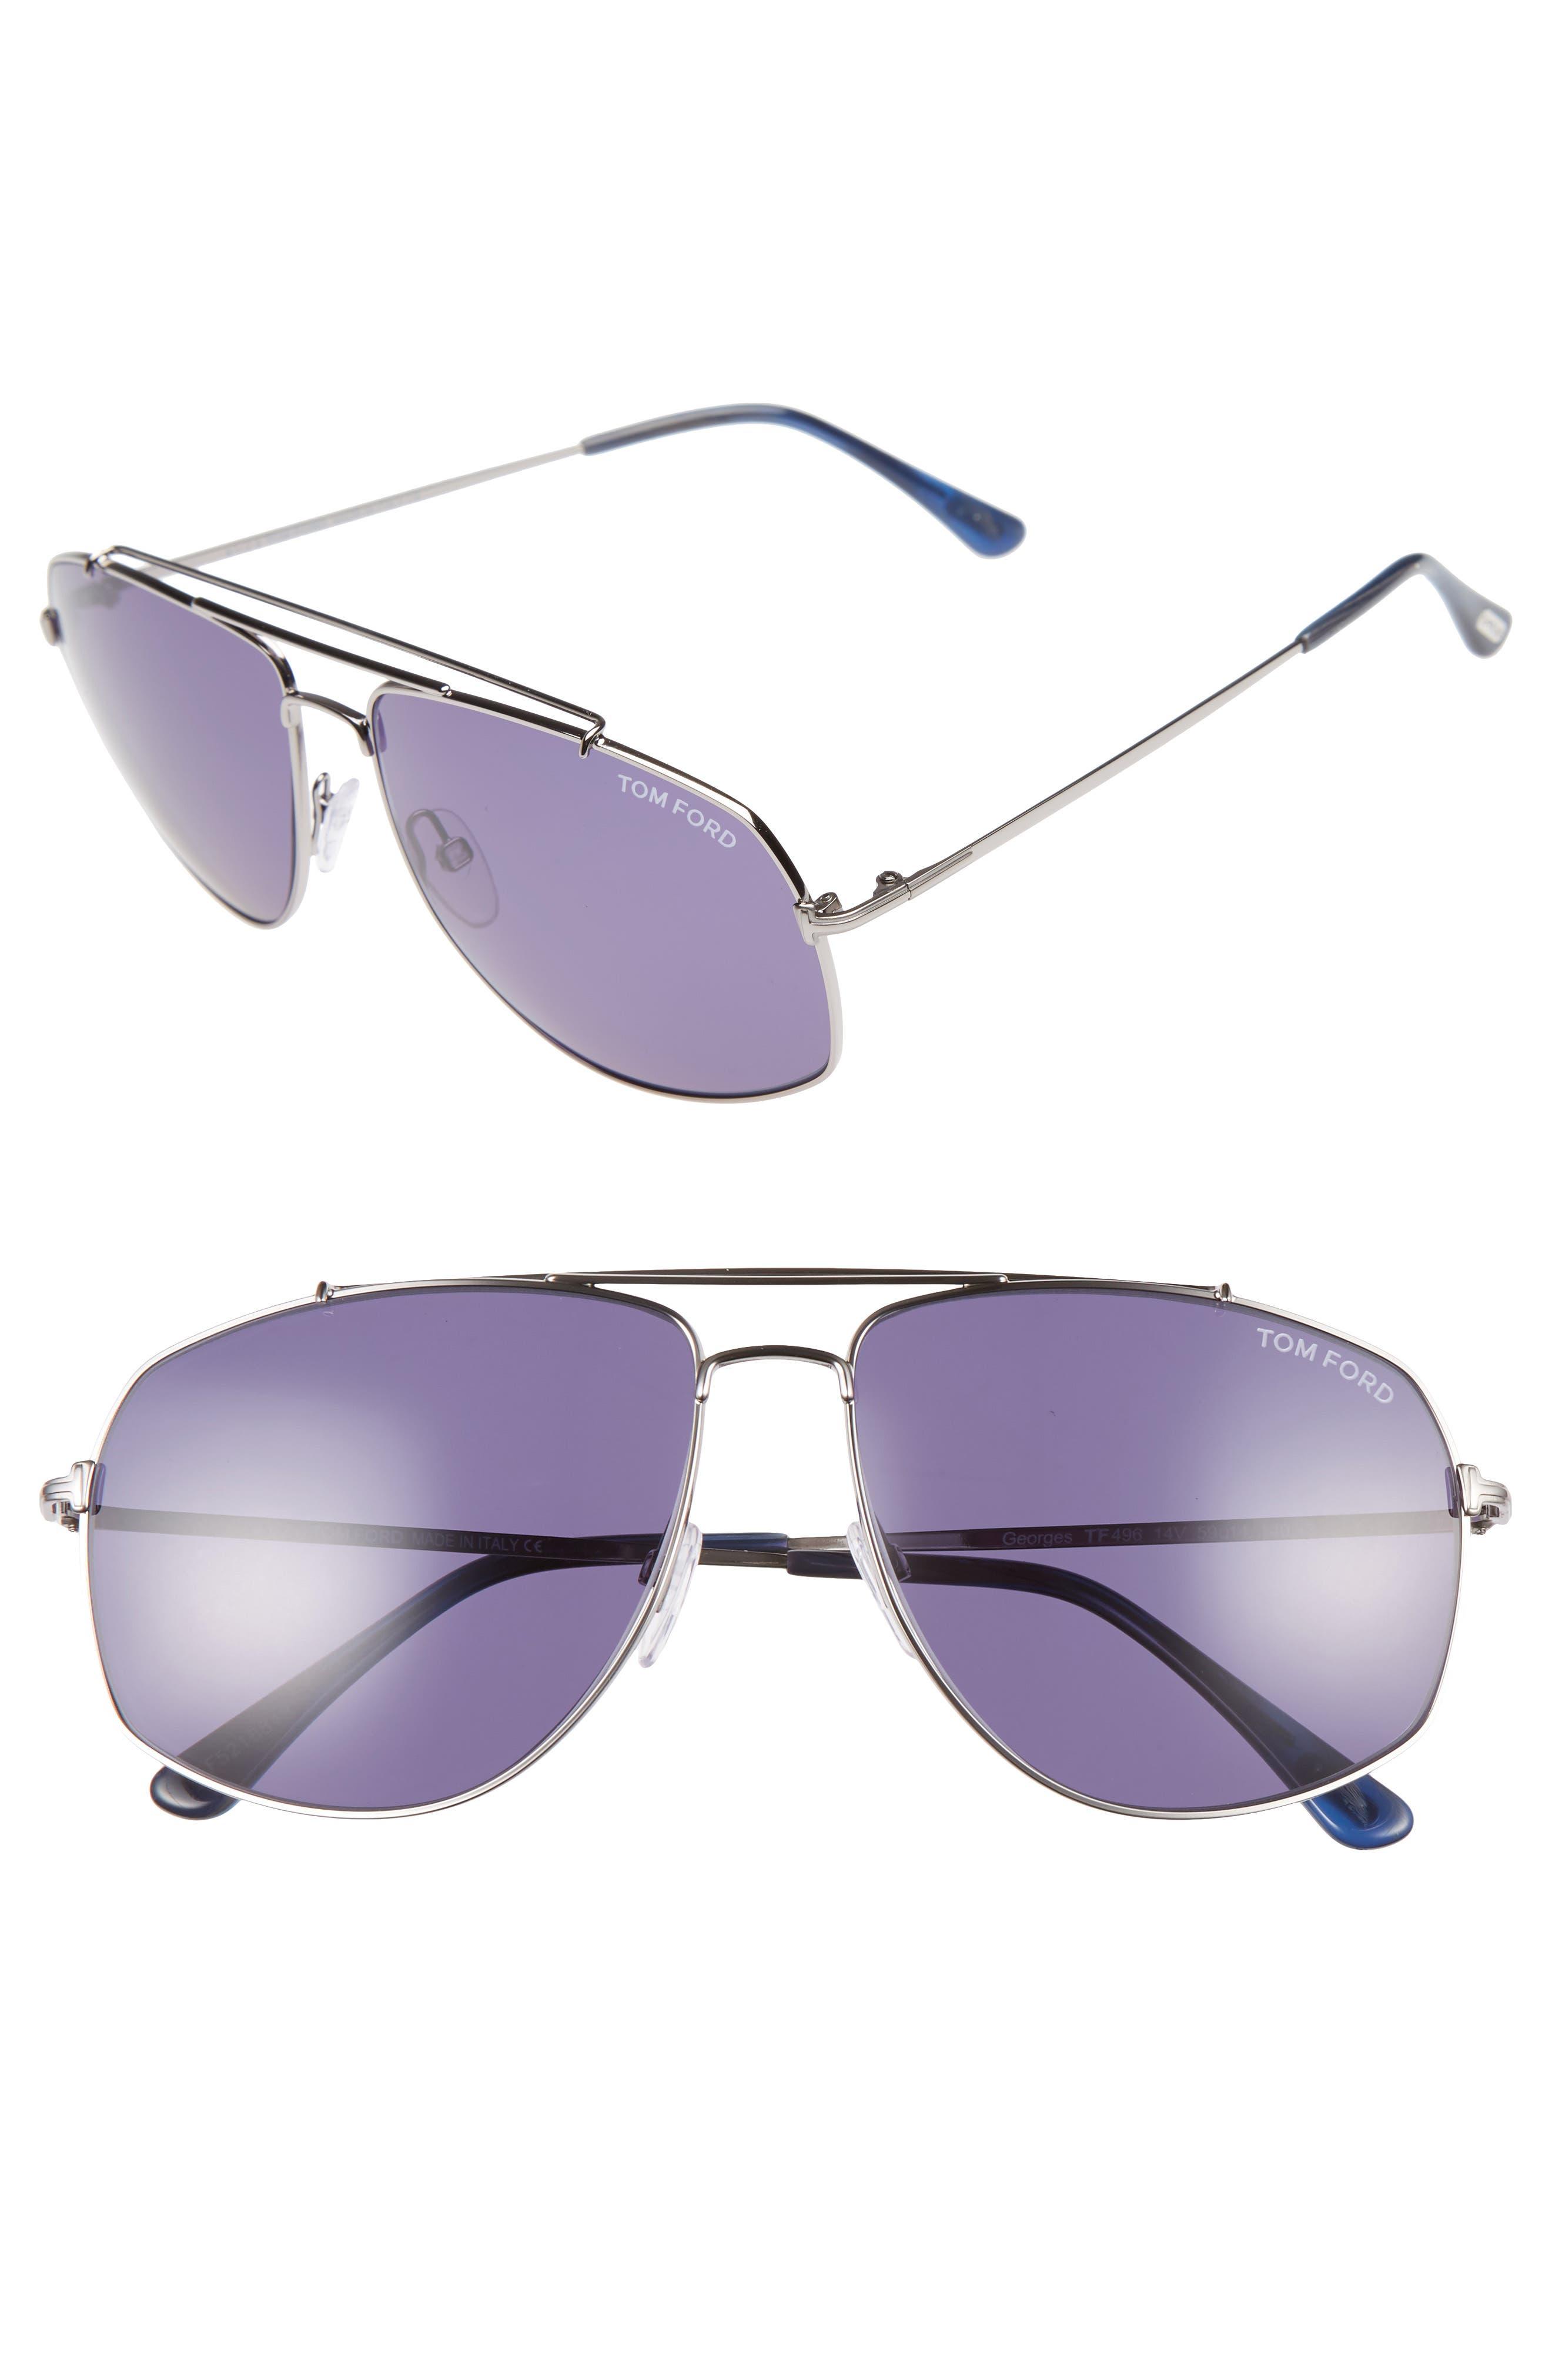 Tom Ford 59mm Aviator Sunglasses